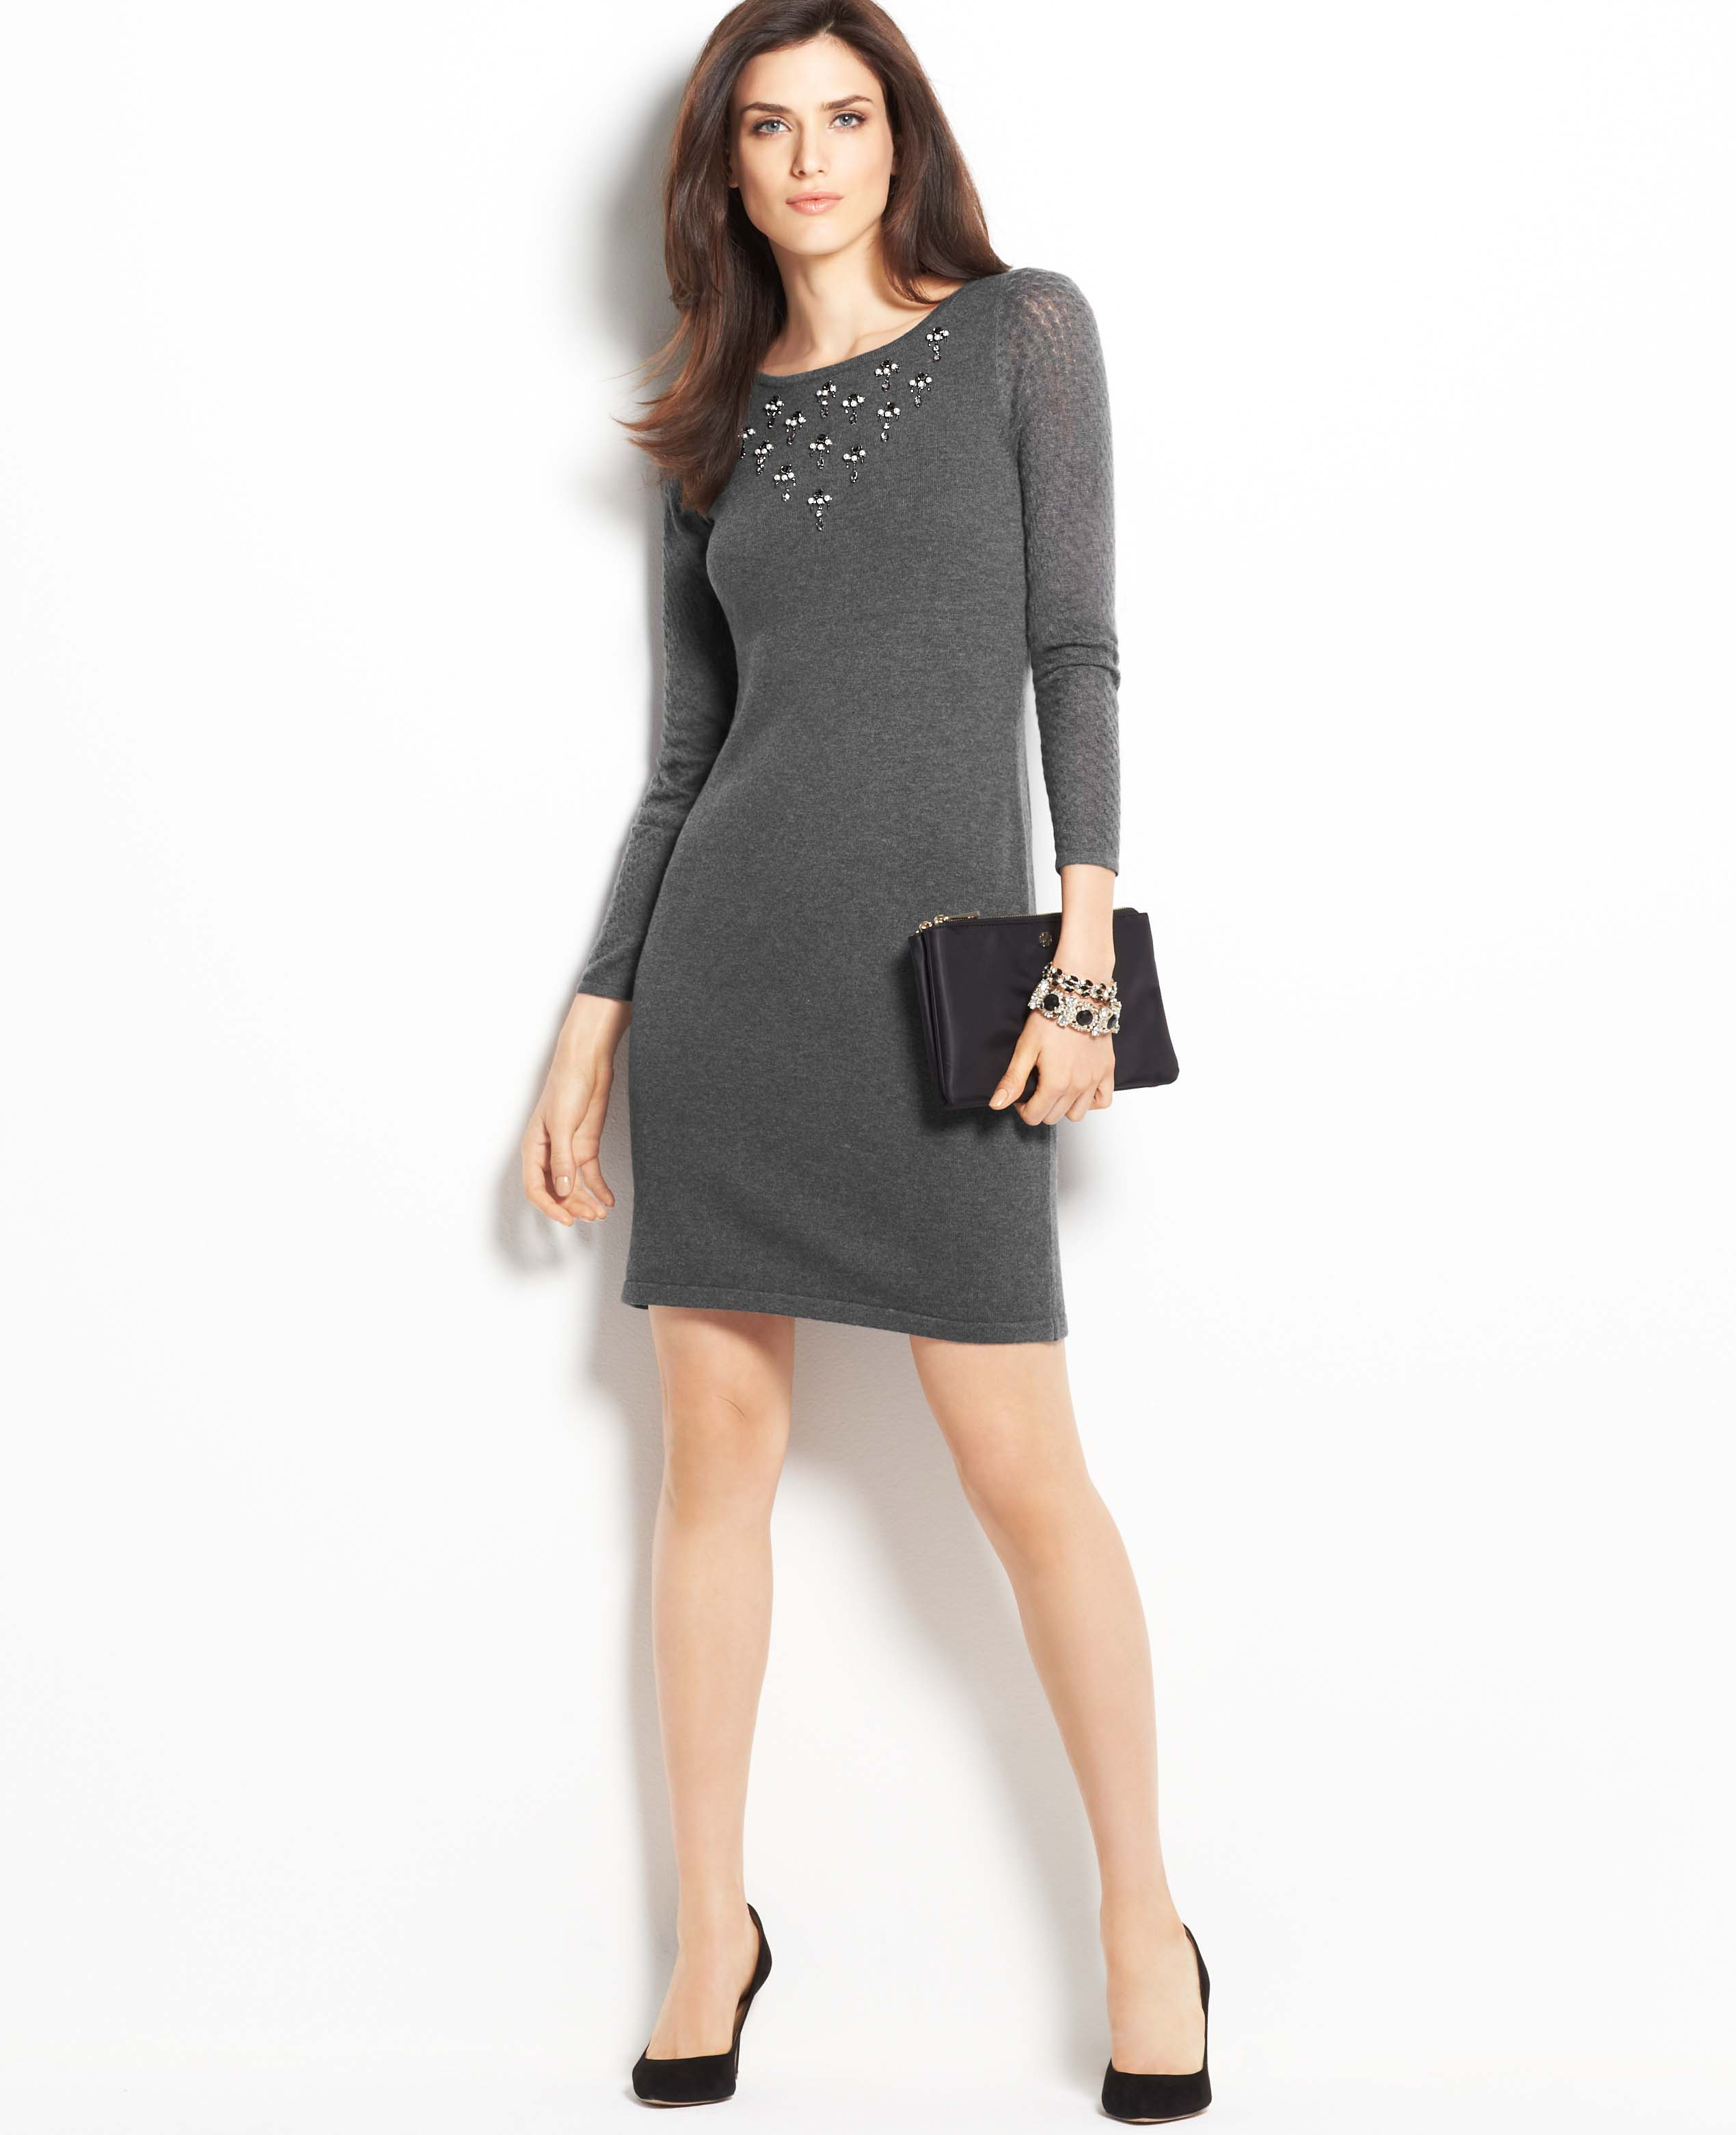 b2517f3f557 Ann Taylor Embellished Sweater Dress in Gray - Lyst